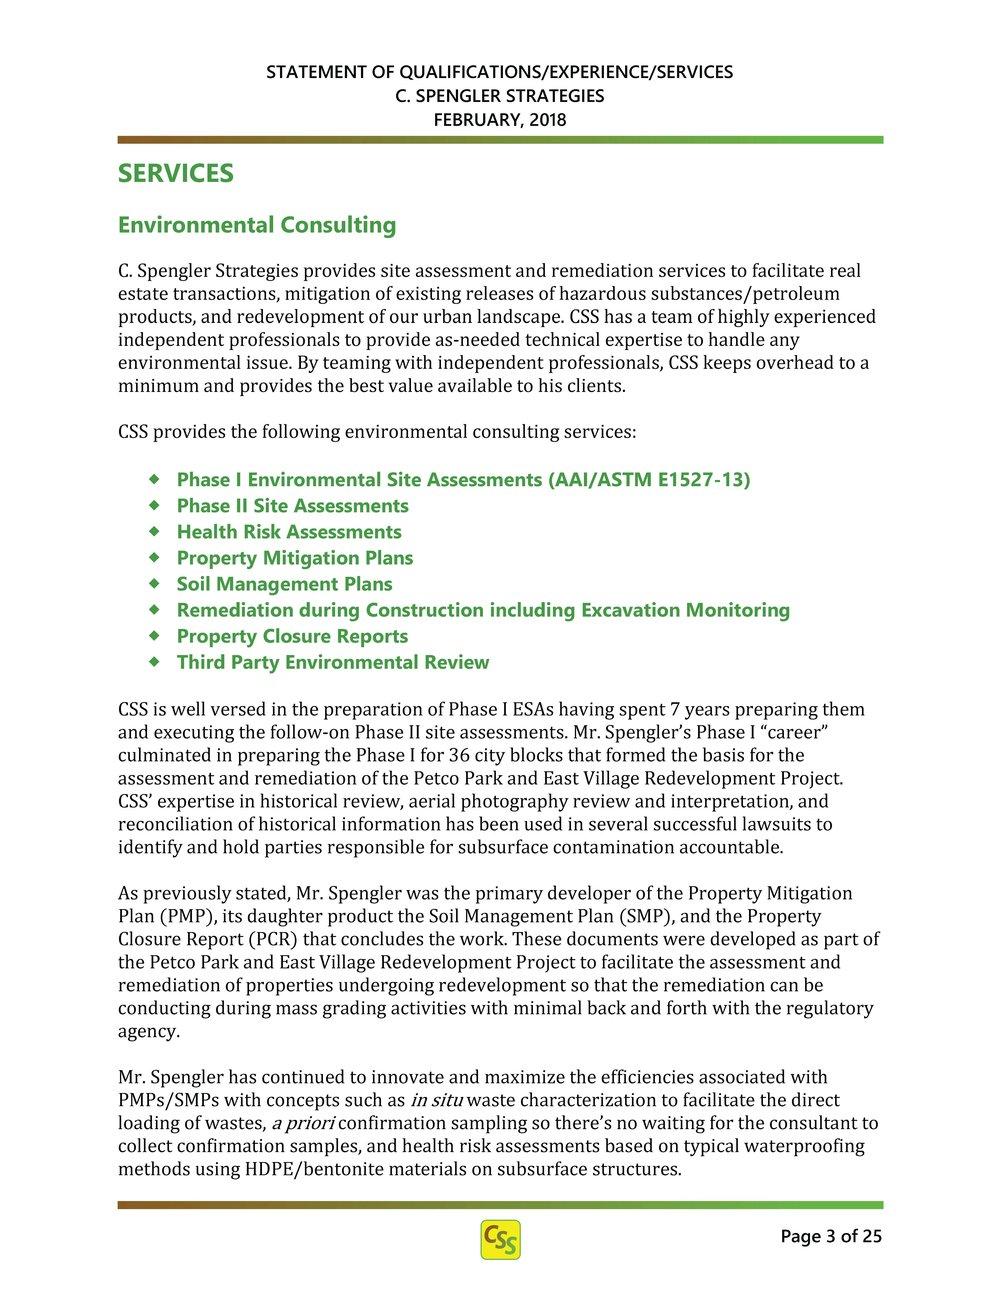 C.Spengler Strategies SOQ.2.13.18_Page_04.jpg